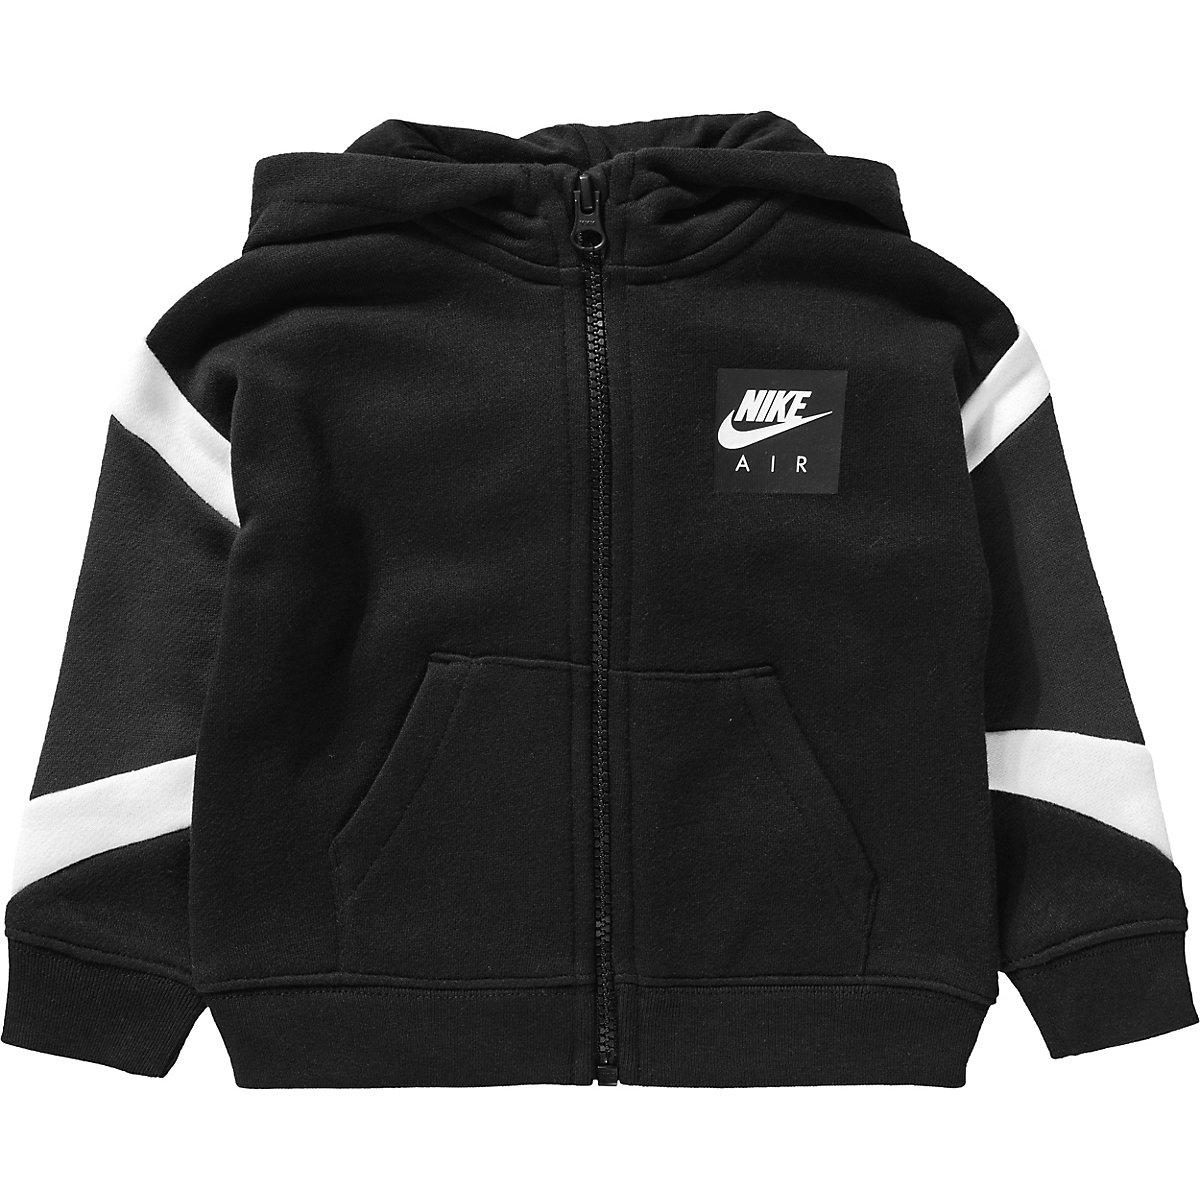 Kinder Jogginganzug Nike